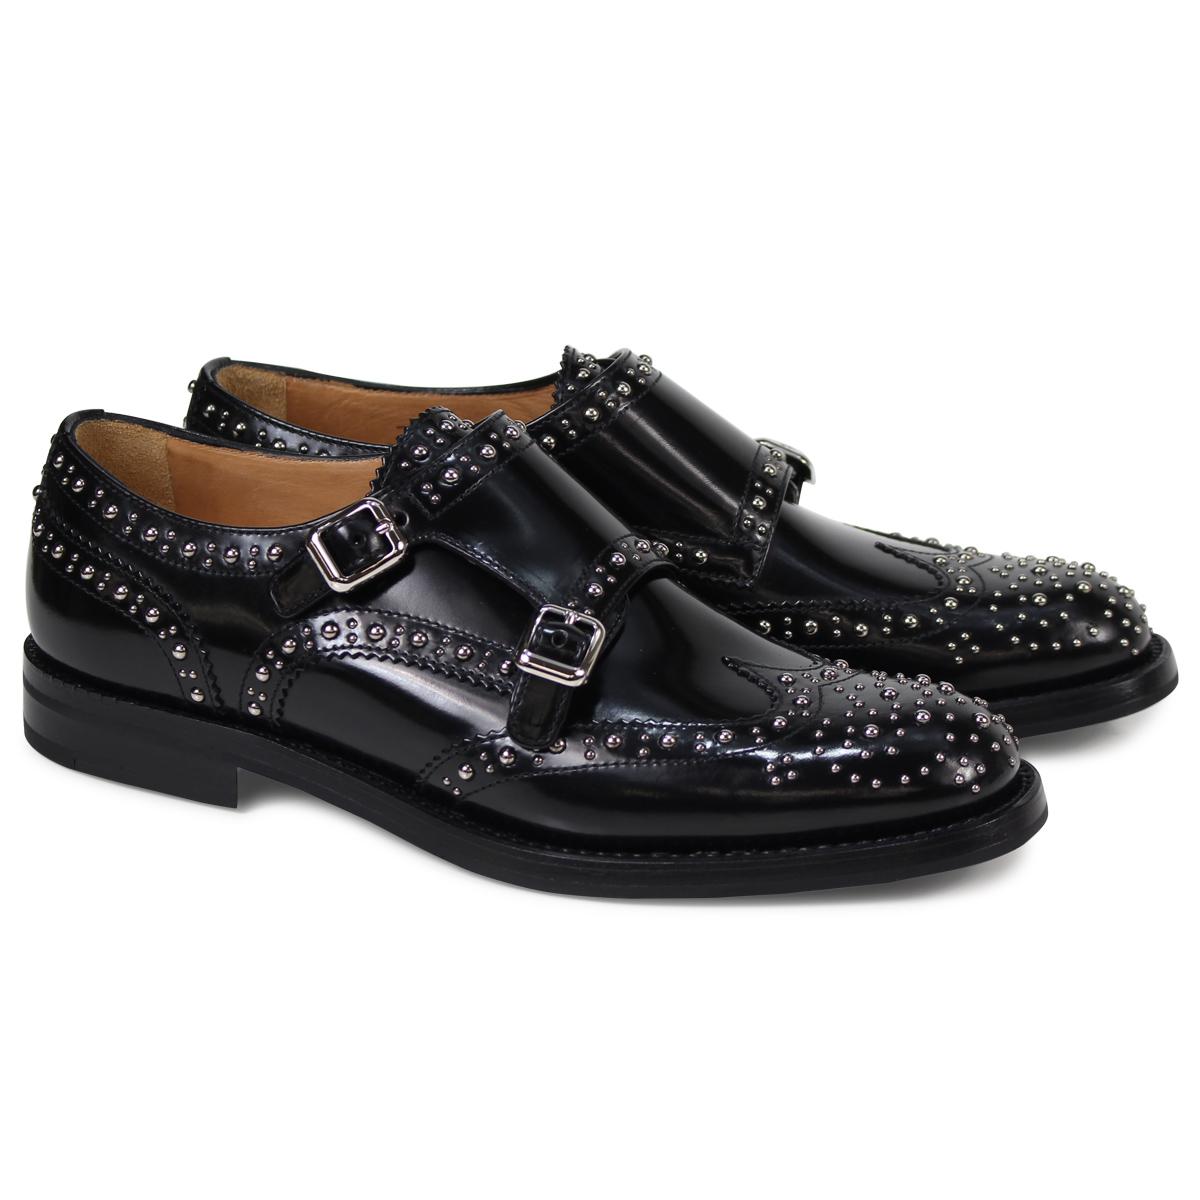 a6e24781b2cb Church s LANA MET church shoes Lady s double Monk shoes studs black DO0002   3 15 Shinnyu load